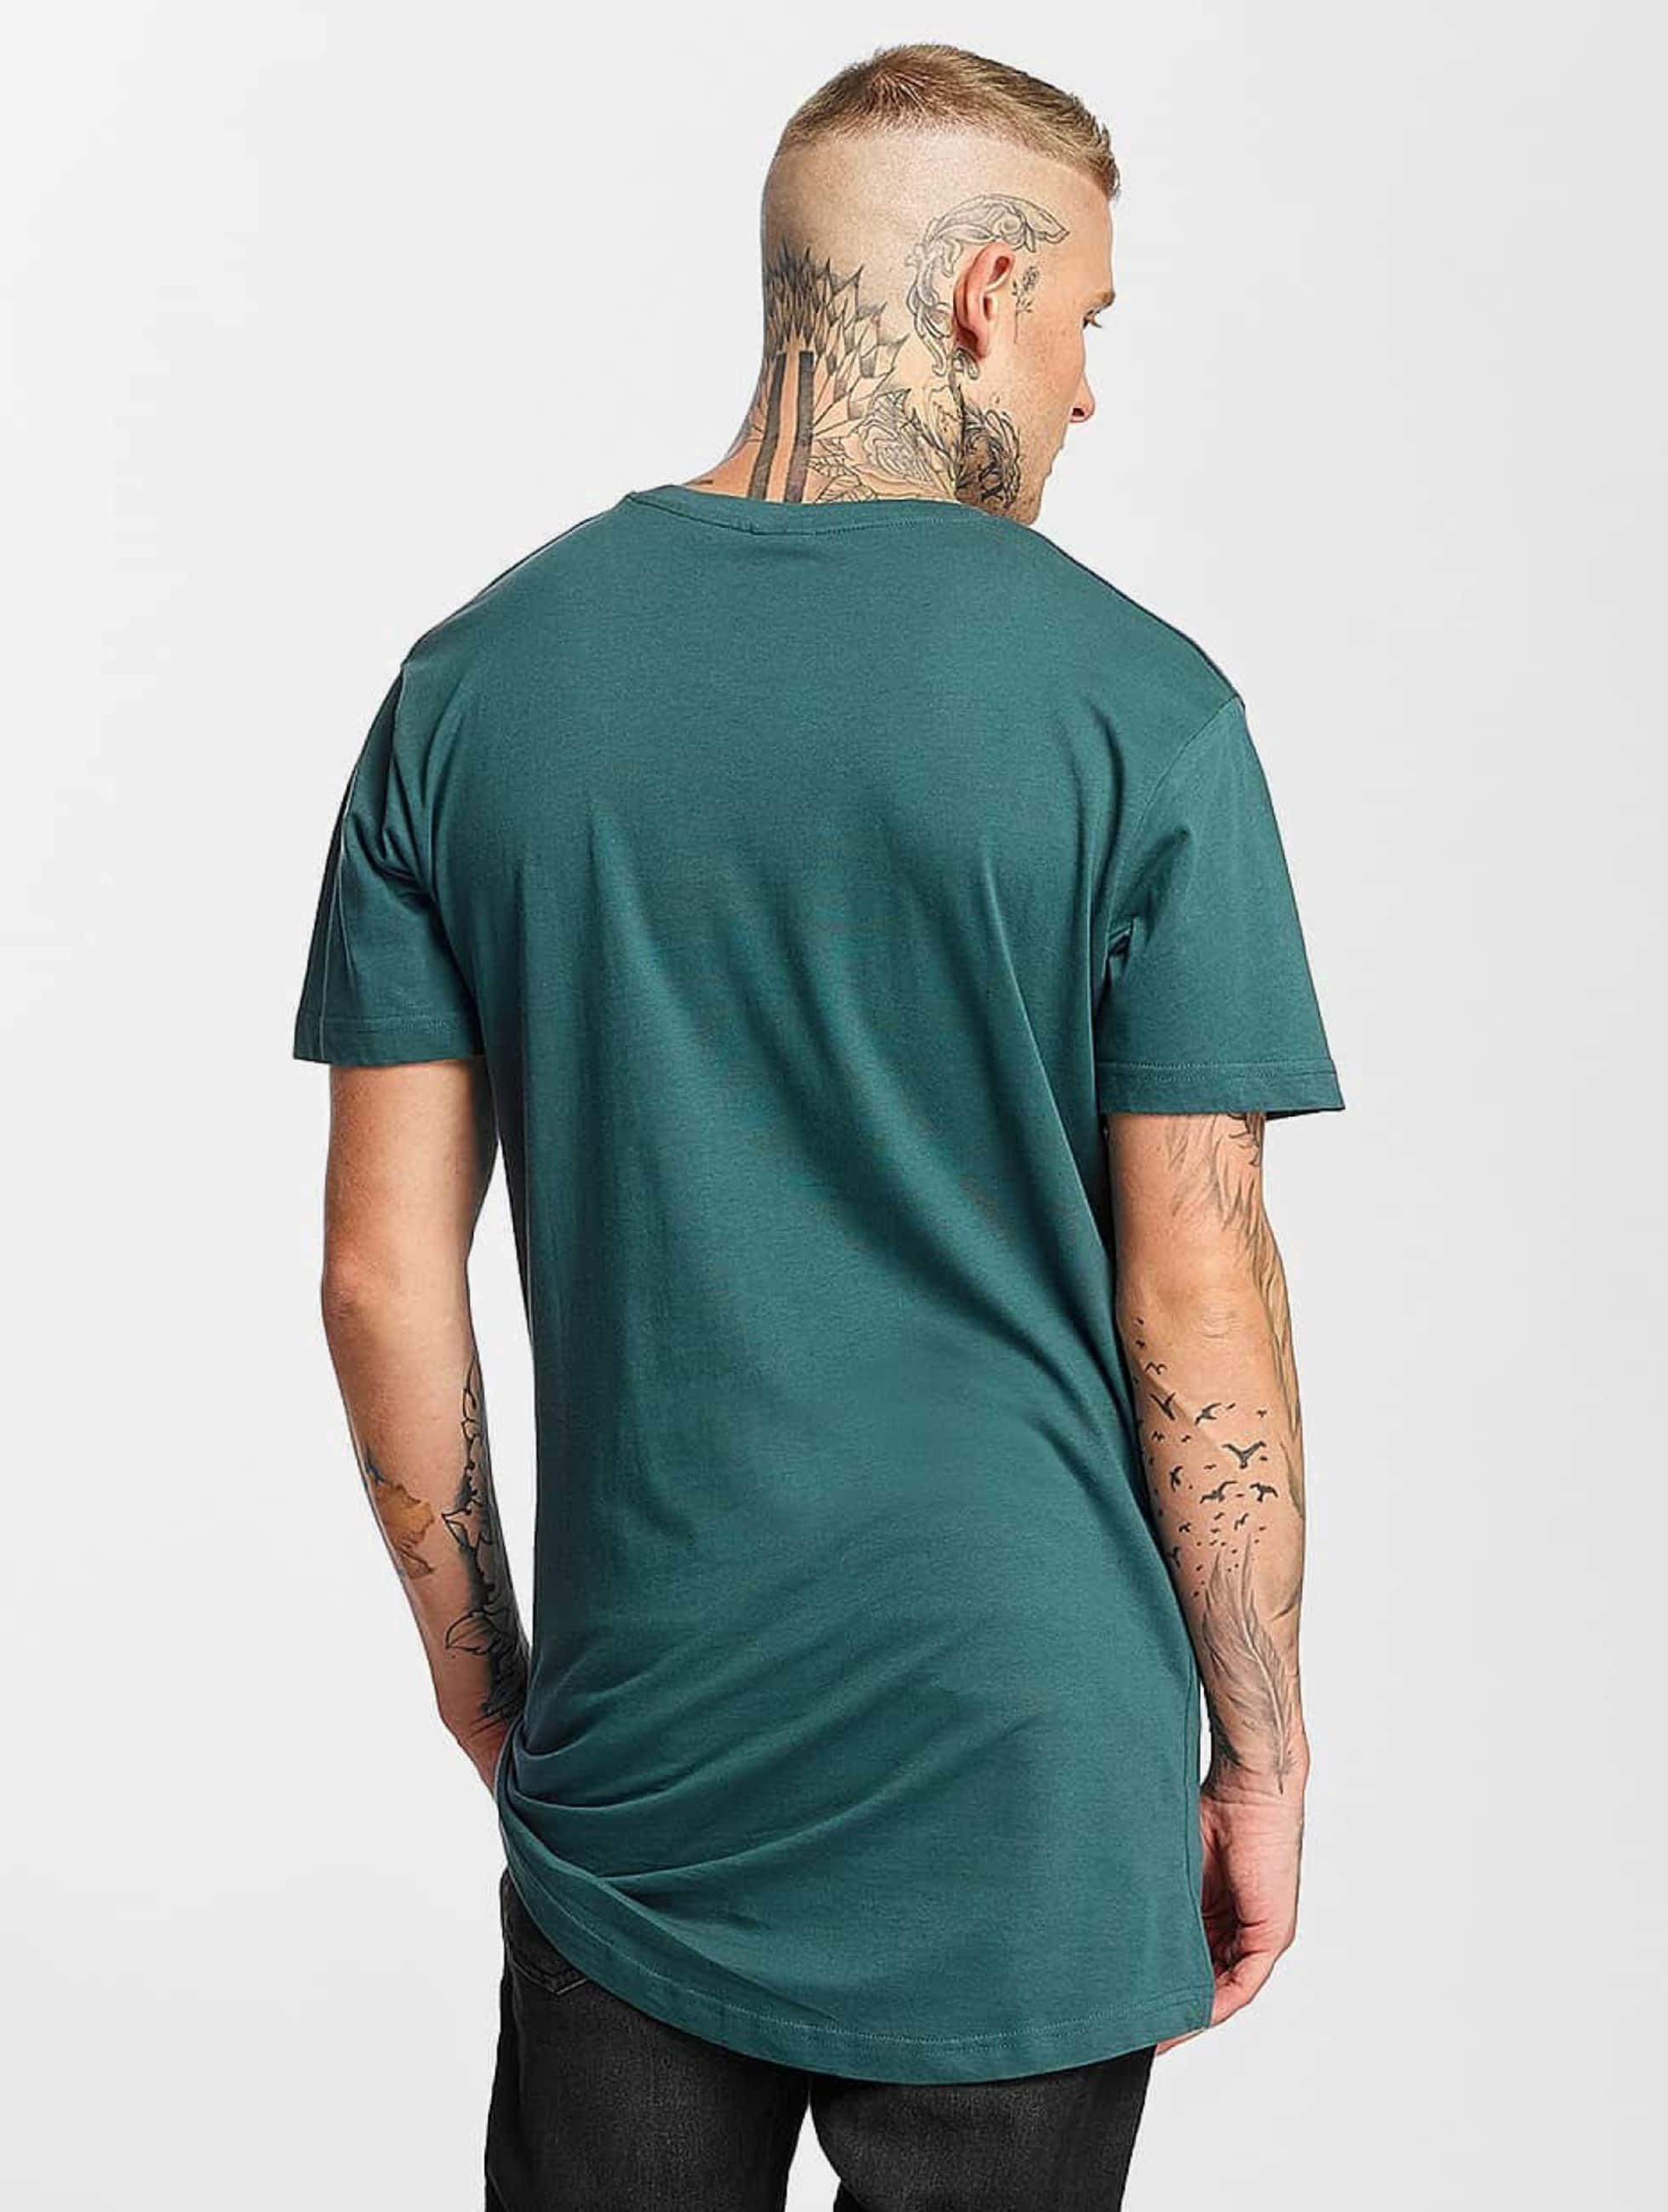 Urban Classics Tall Tees Shaped Long turquois